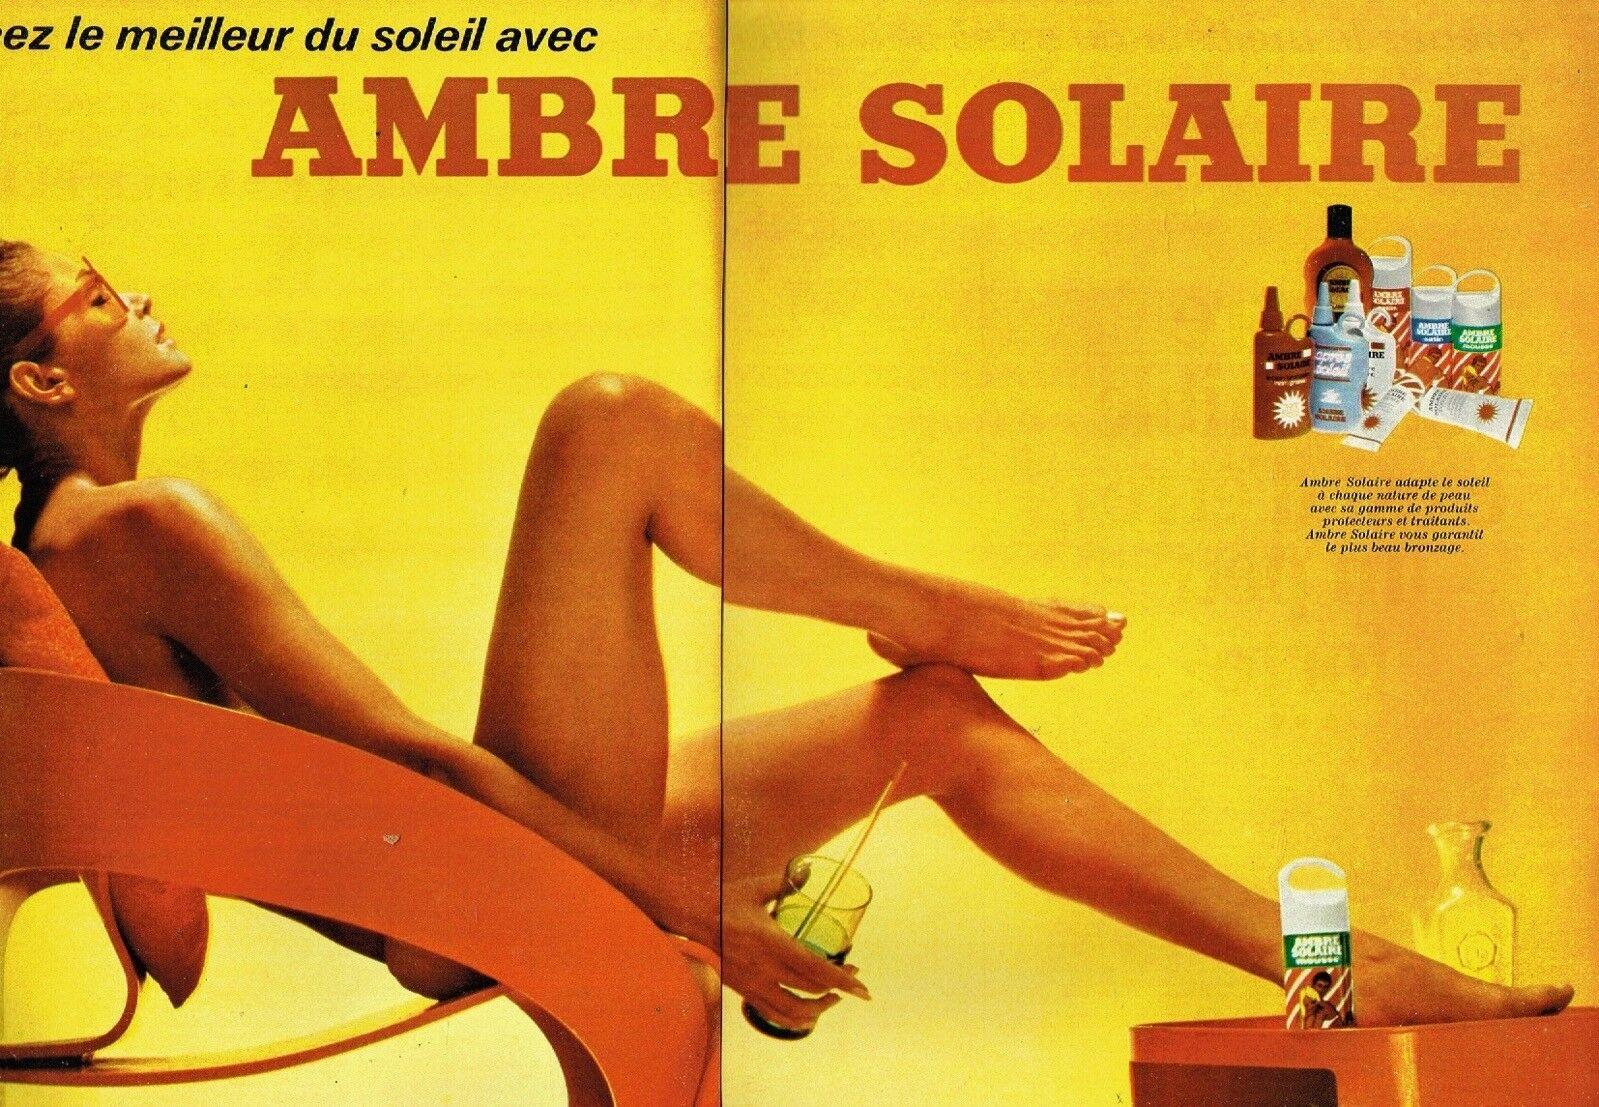 1969 Ambre Solaire